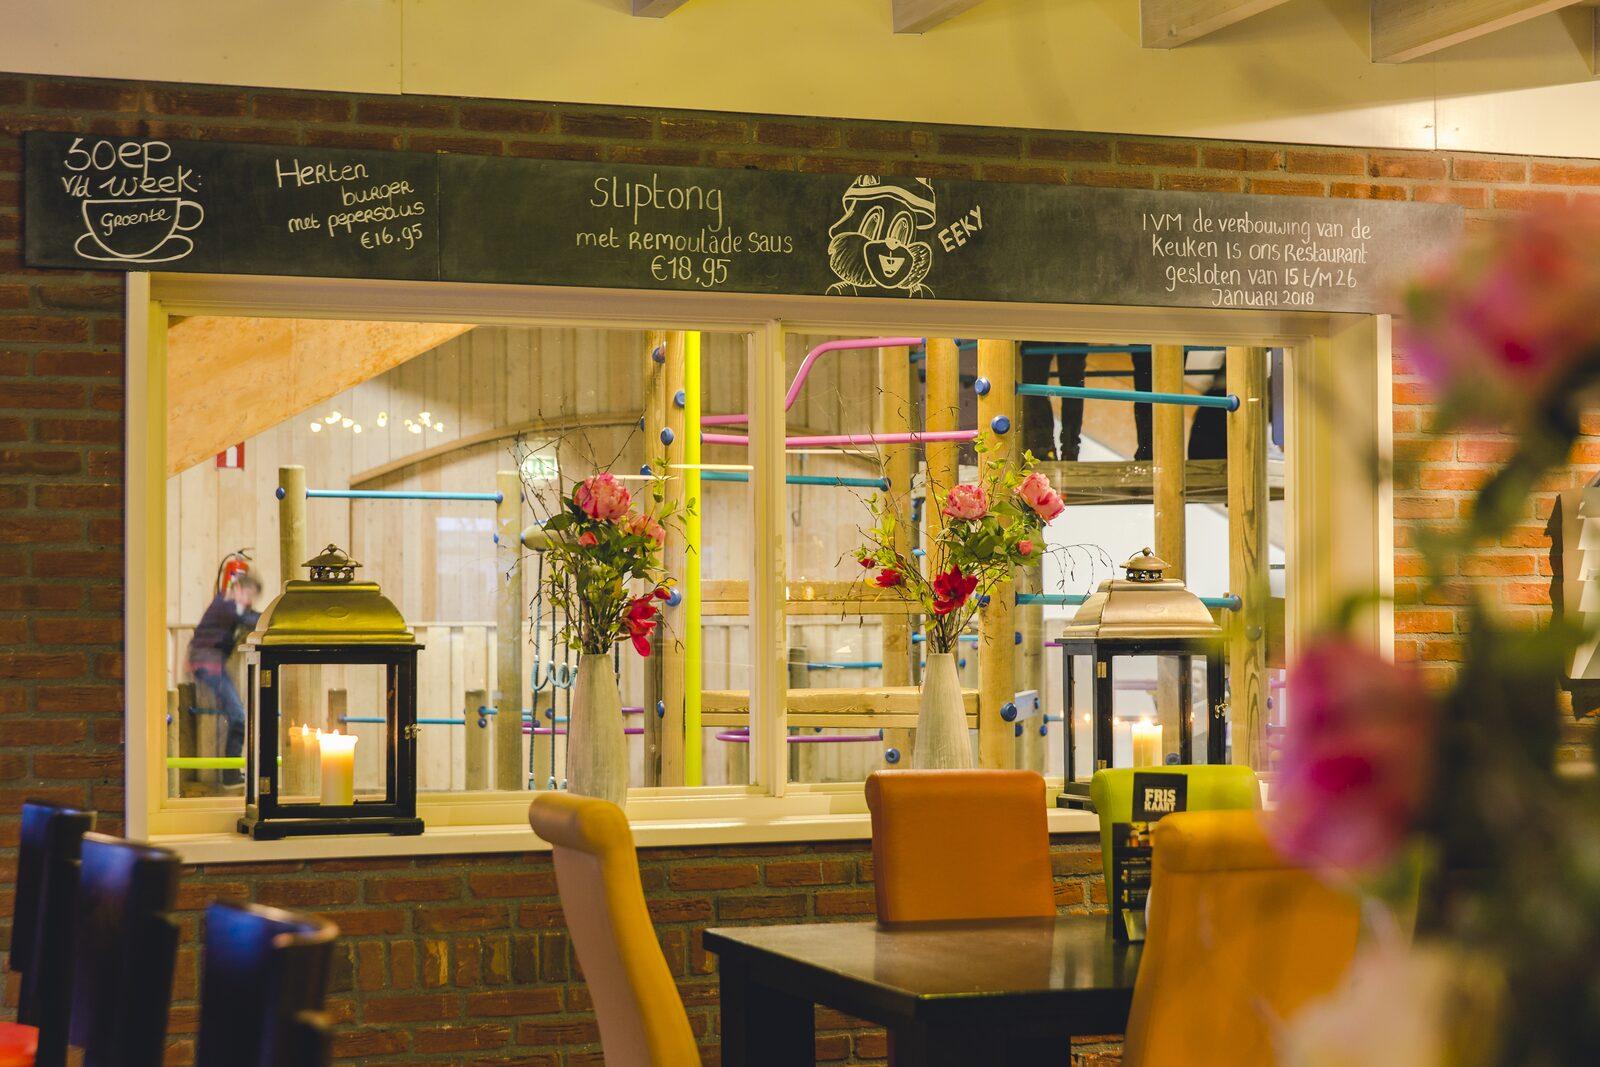 Kindvriendelijk restaurant